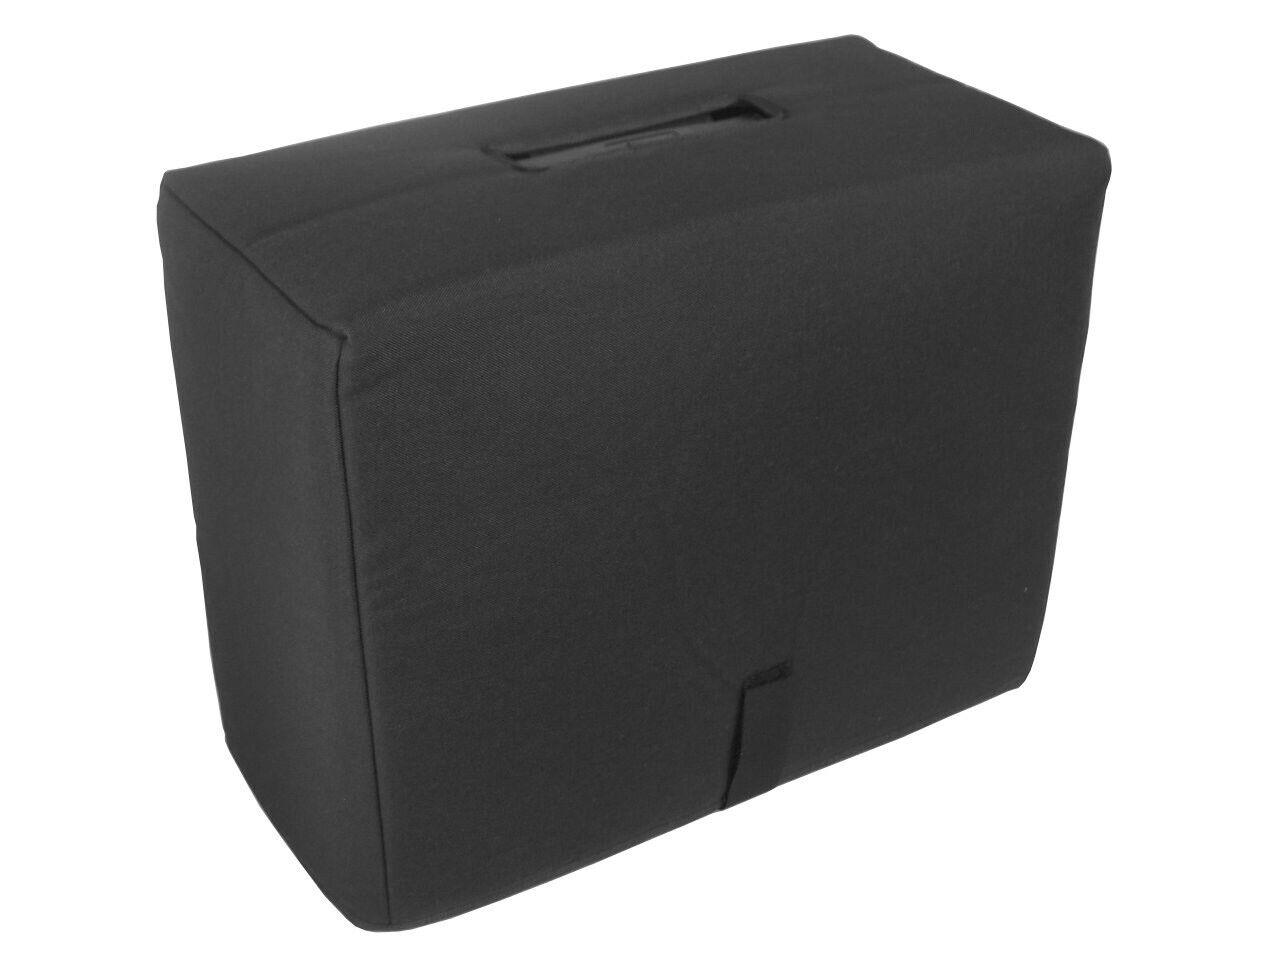 Texotica Saratoga 1x12 Combo Amp Cover - Schwarz, Wasser Resistant, Tuki (Texo002p)